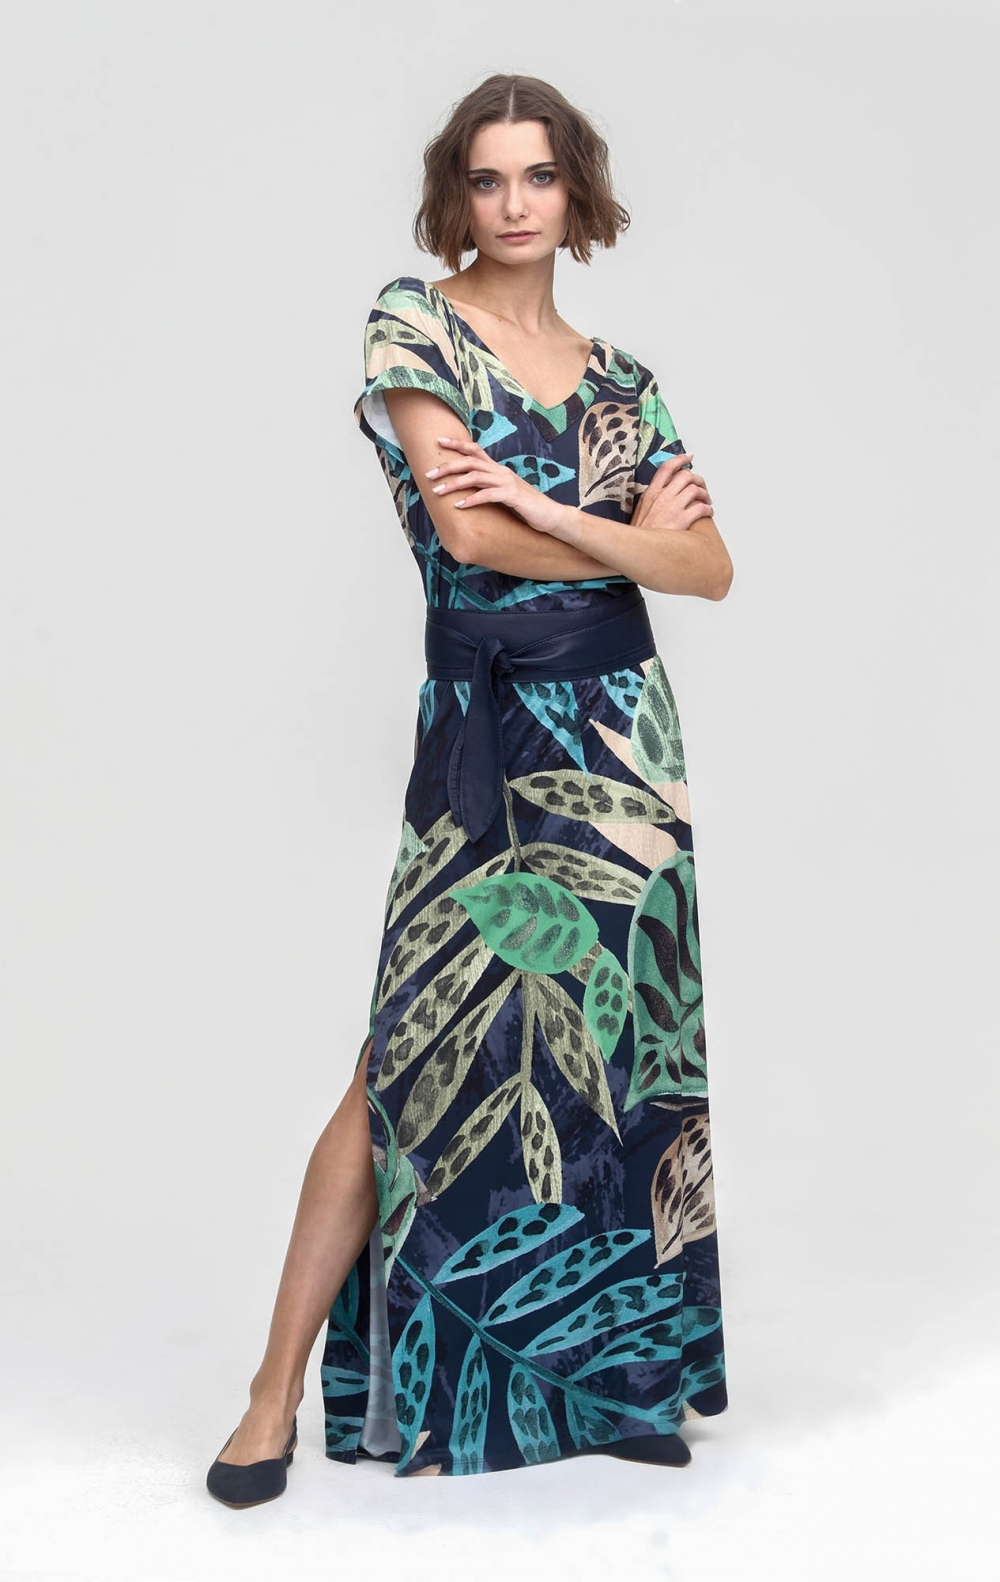 Vestido Malha Carla Estampado  - Foto 2